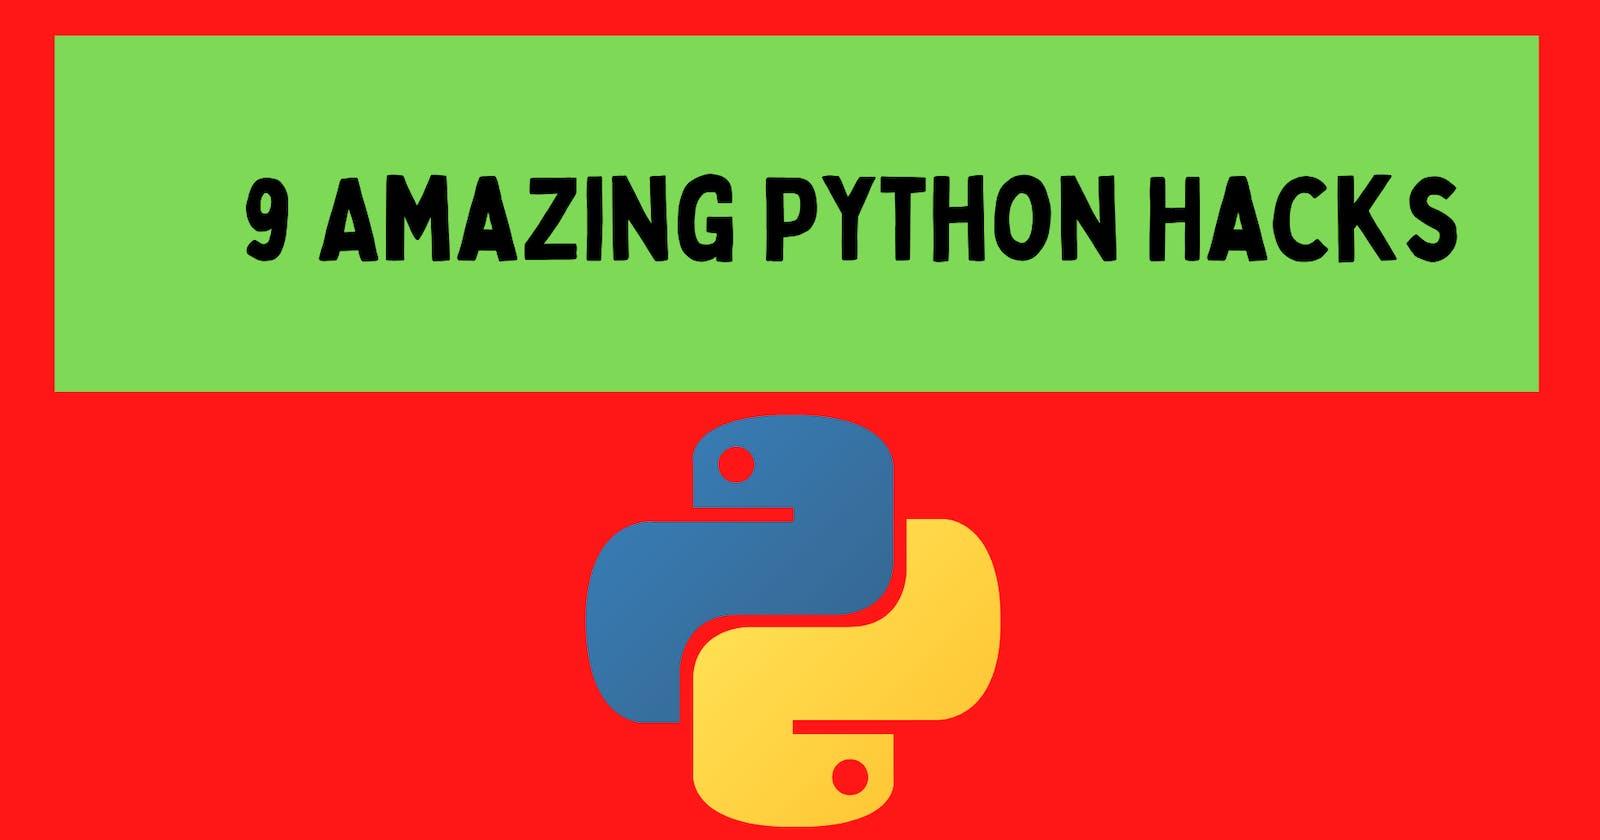 9 Amazing Python Hacks